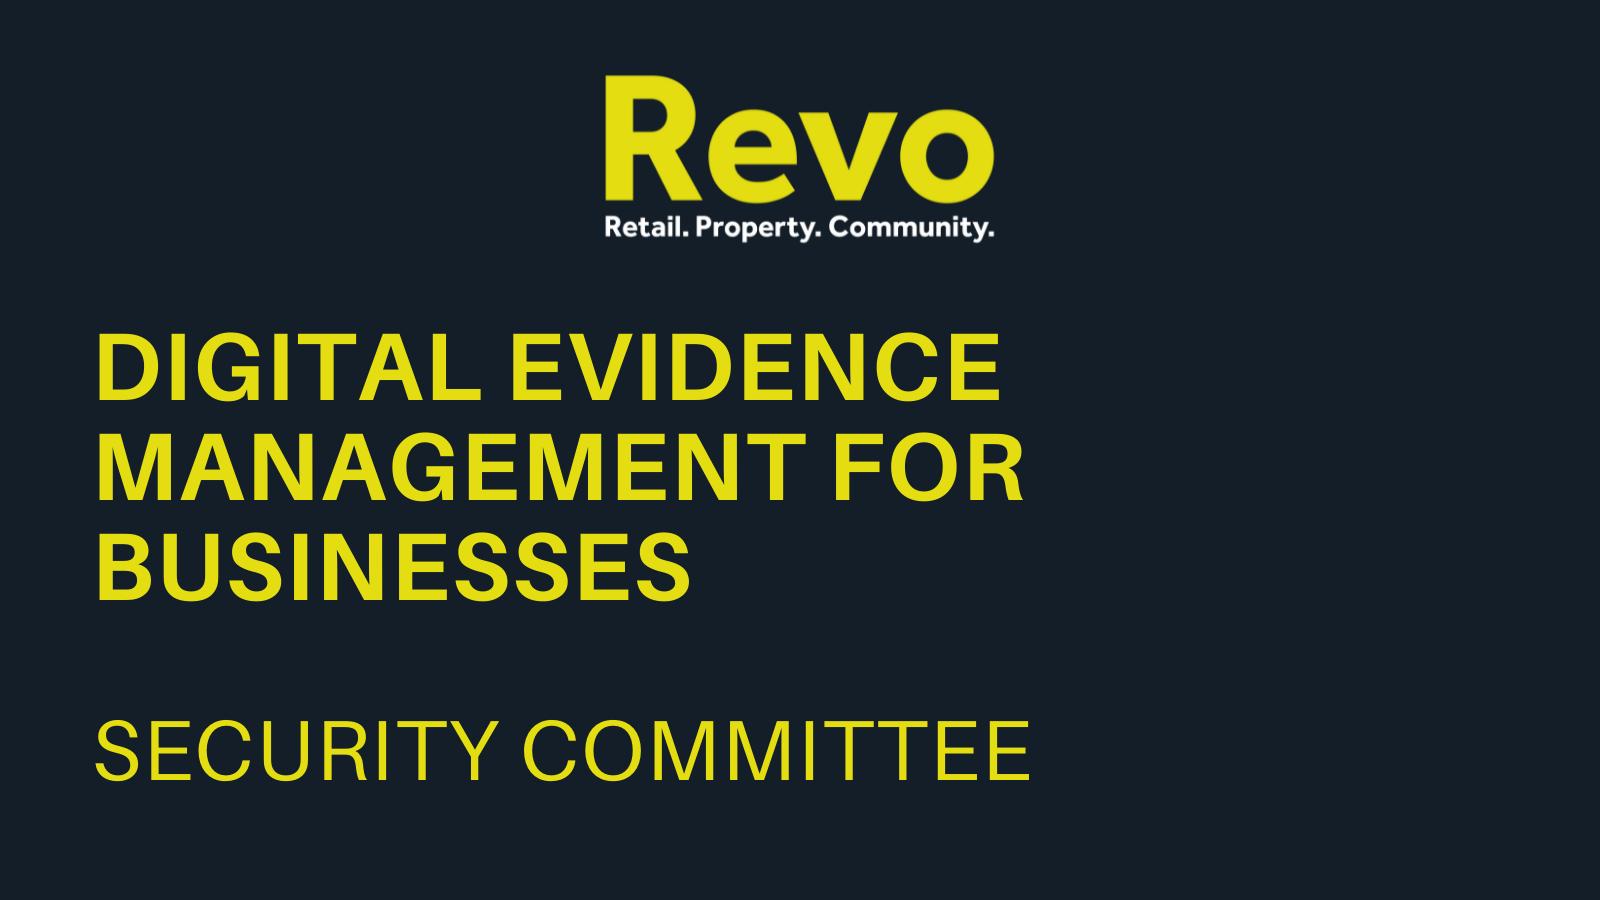 https://revocommunity.org/wp-content/uploads/2021/07/Digital-Evidence-Management-for-Businesses.pdf